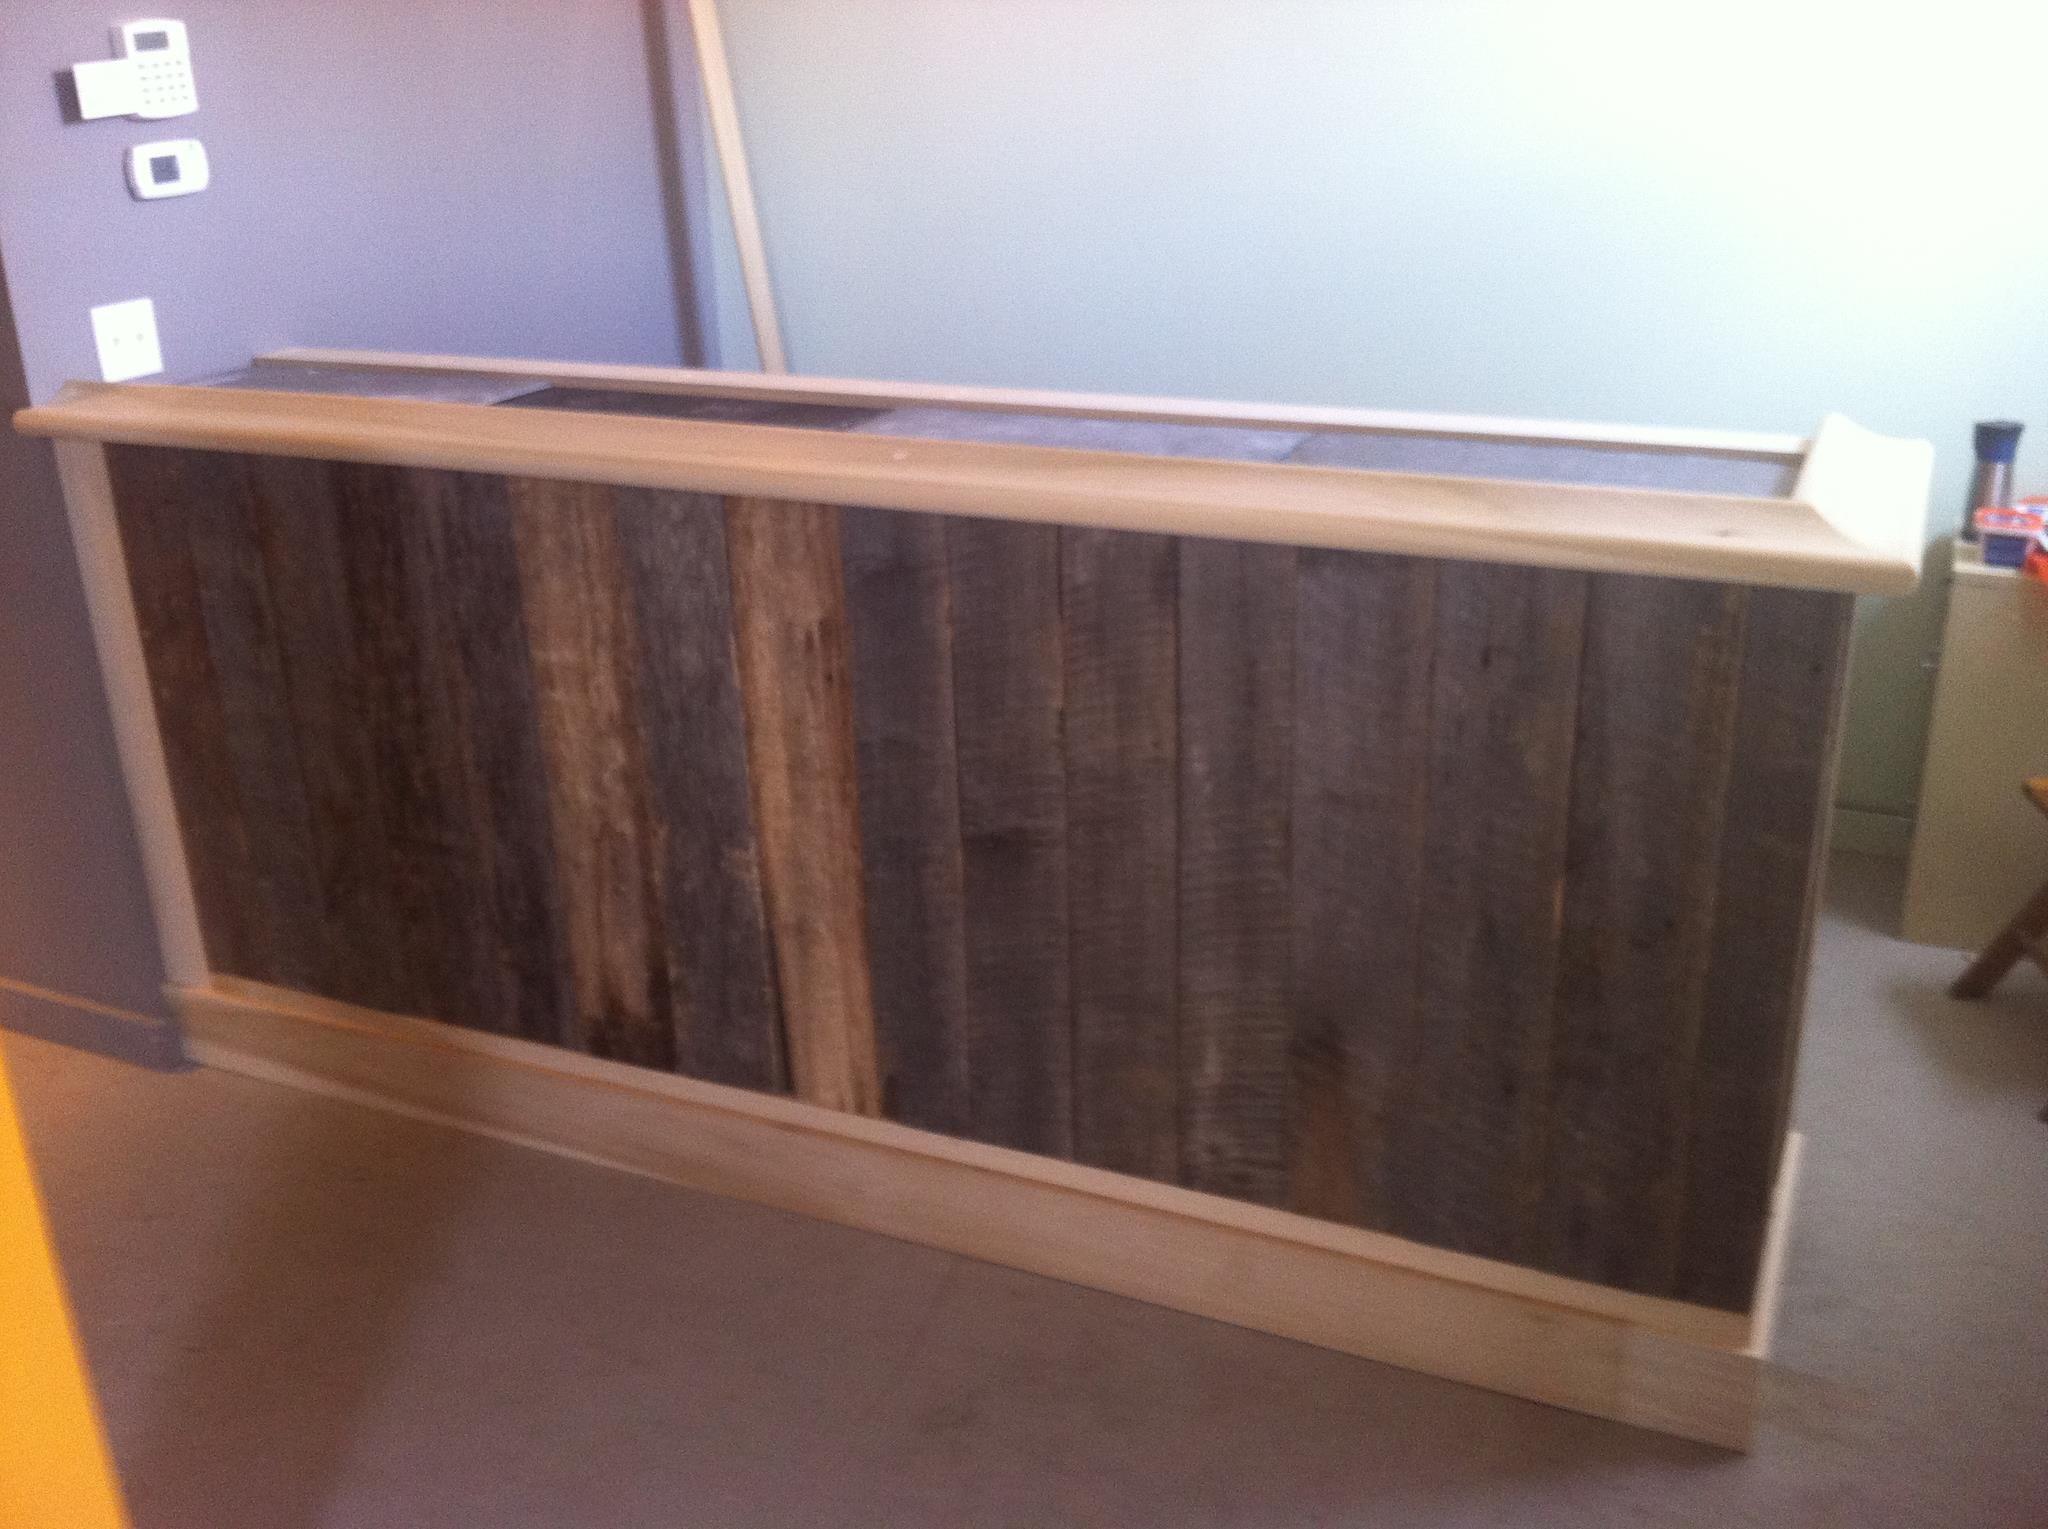 100 year old barn siding + 100 year old reclaimed slate + modern bar ...